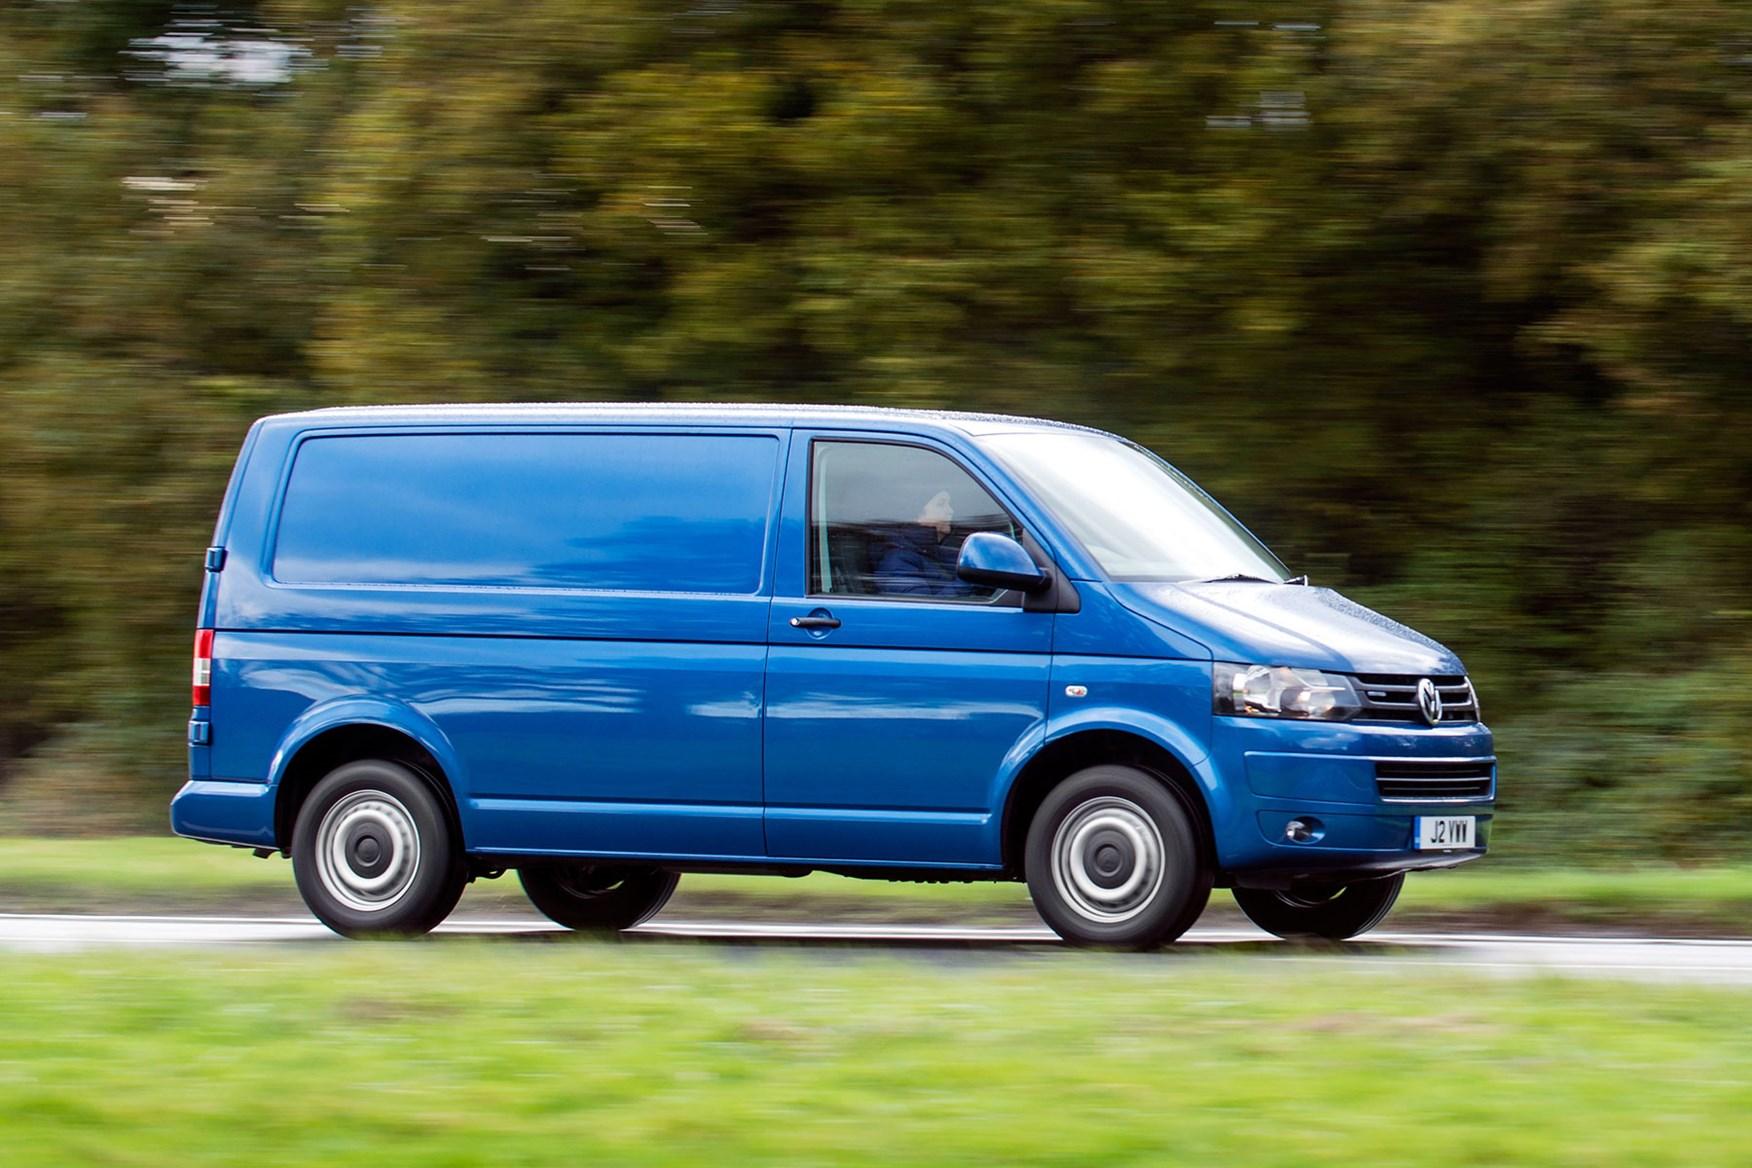 VW Transporter T5 (2010-2015) BlueMotion driving